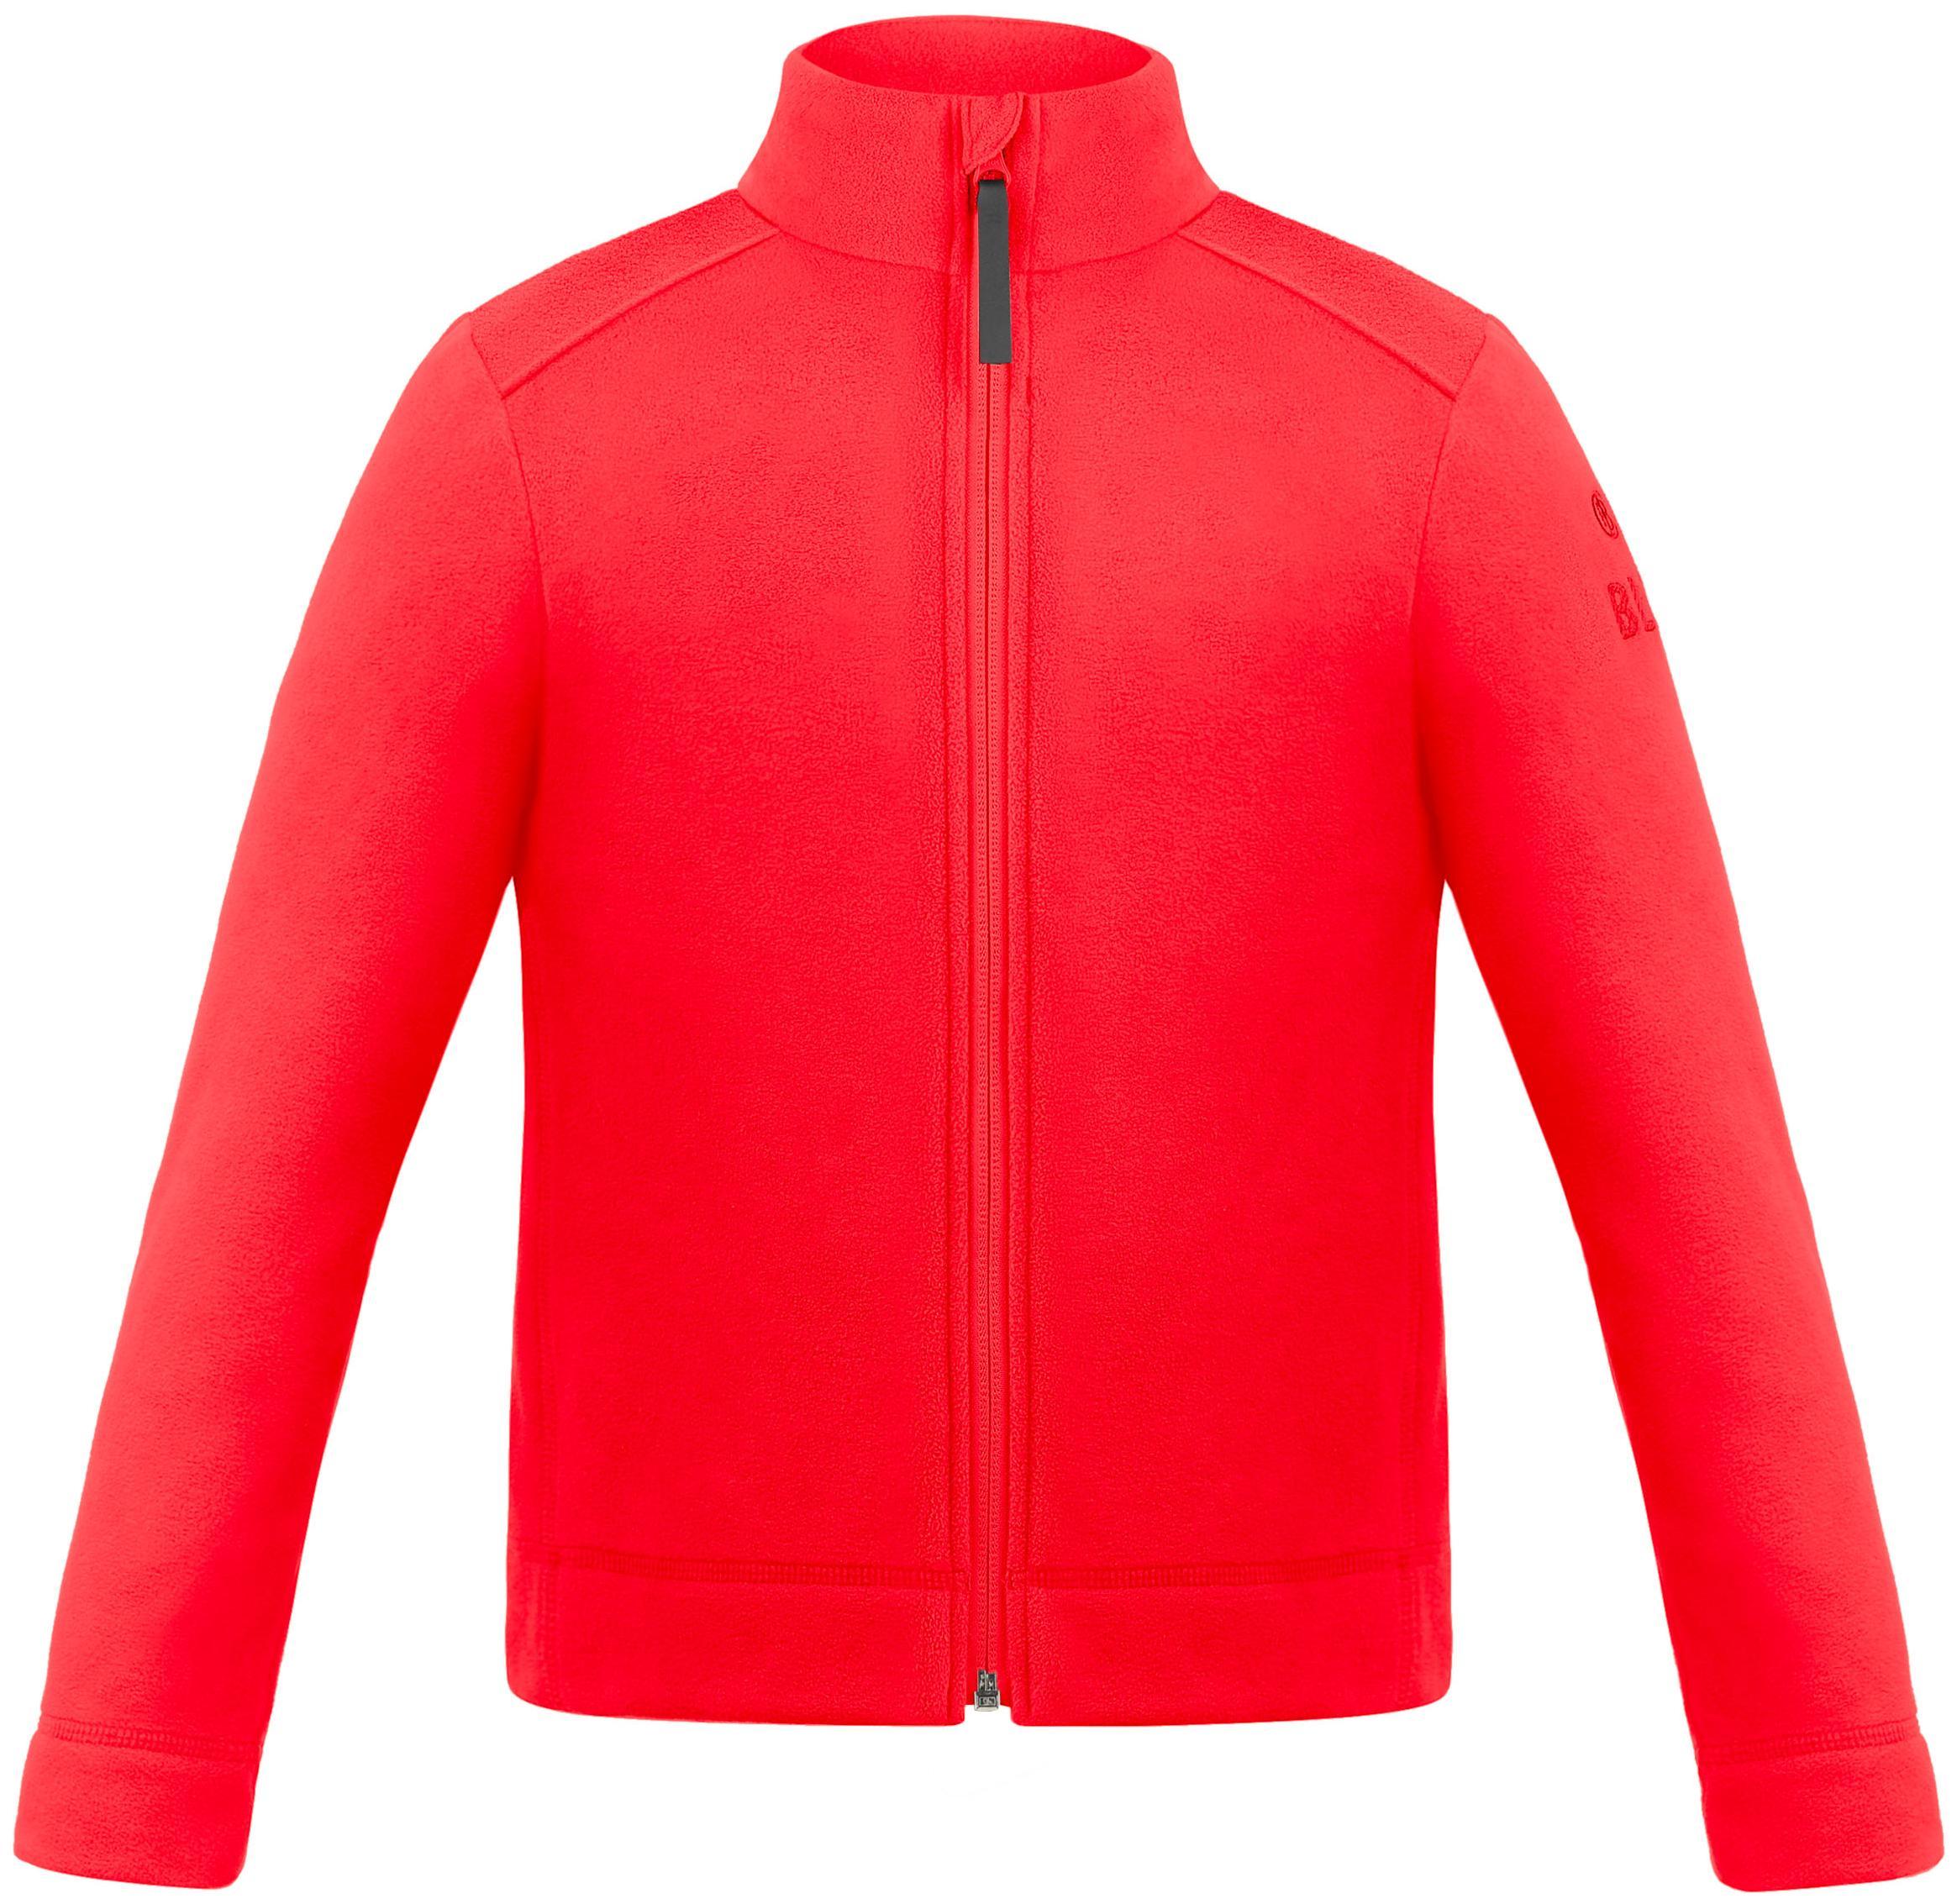 Купить Флис Горнолыжный Poivre Blanc 2020-21 W20-1510-Jrby Scarlet Red 5 (Возраст:14A),